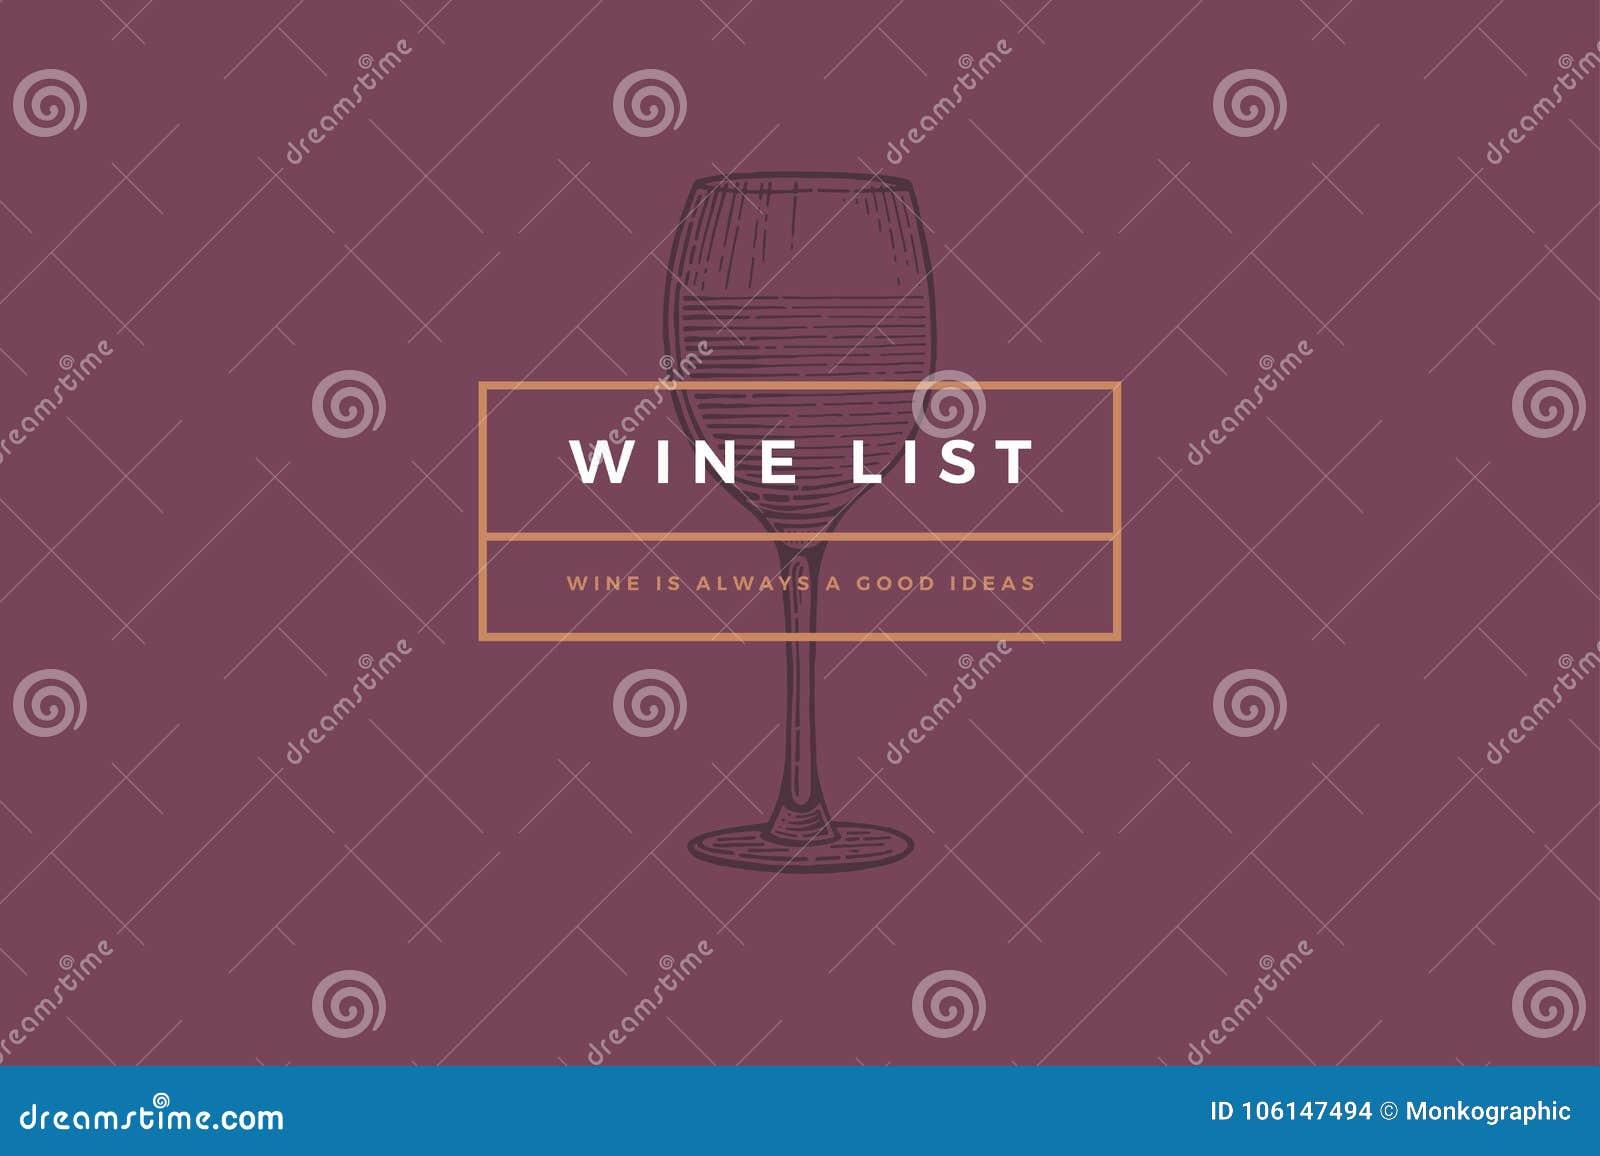 Шаблон логотипа для карточки, листовки, меню, ресторана или бара вина дизайна